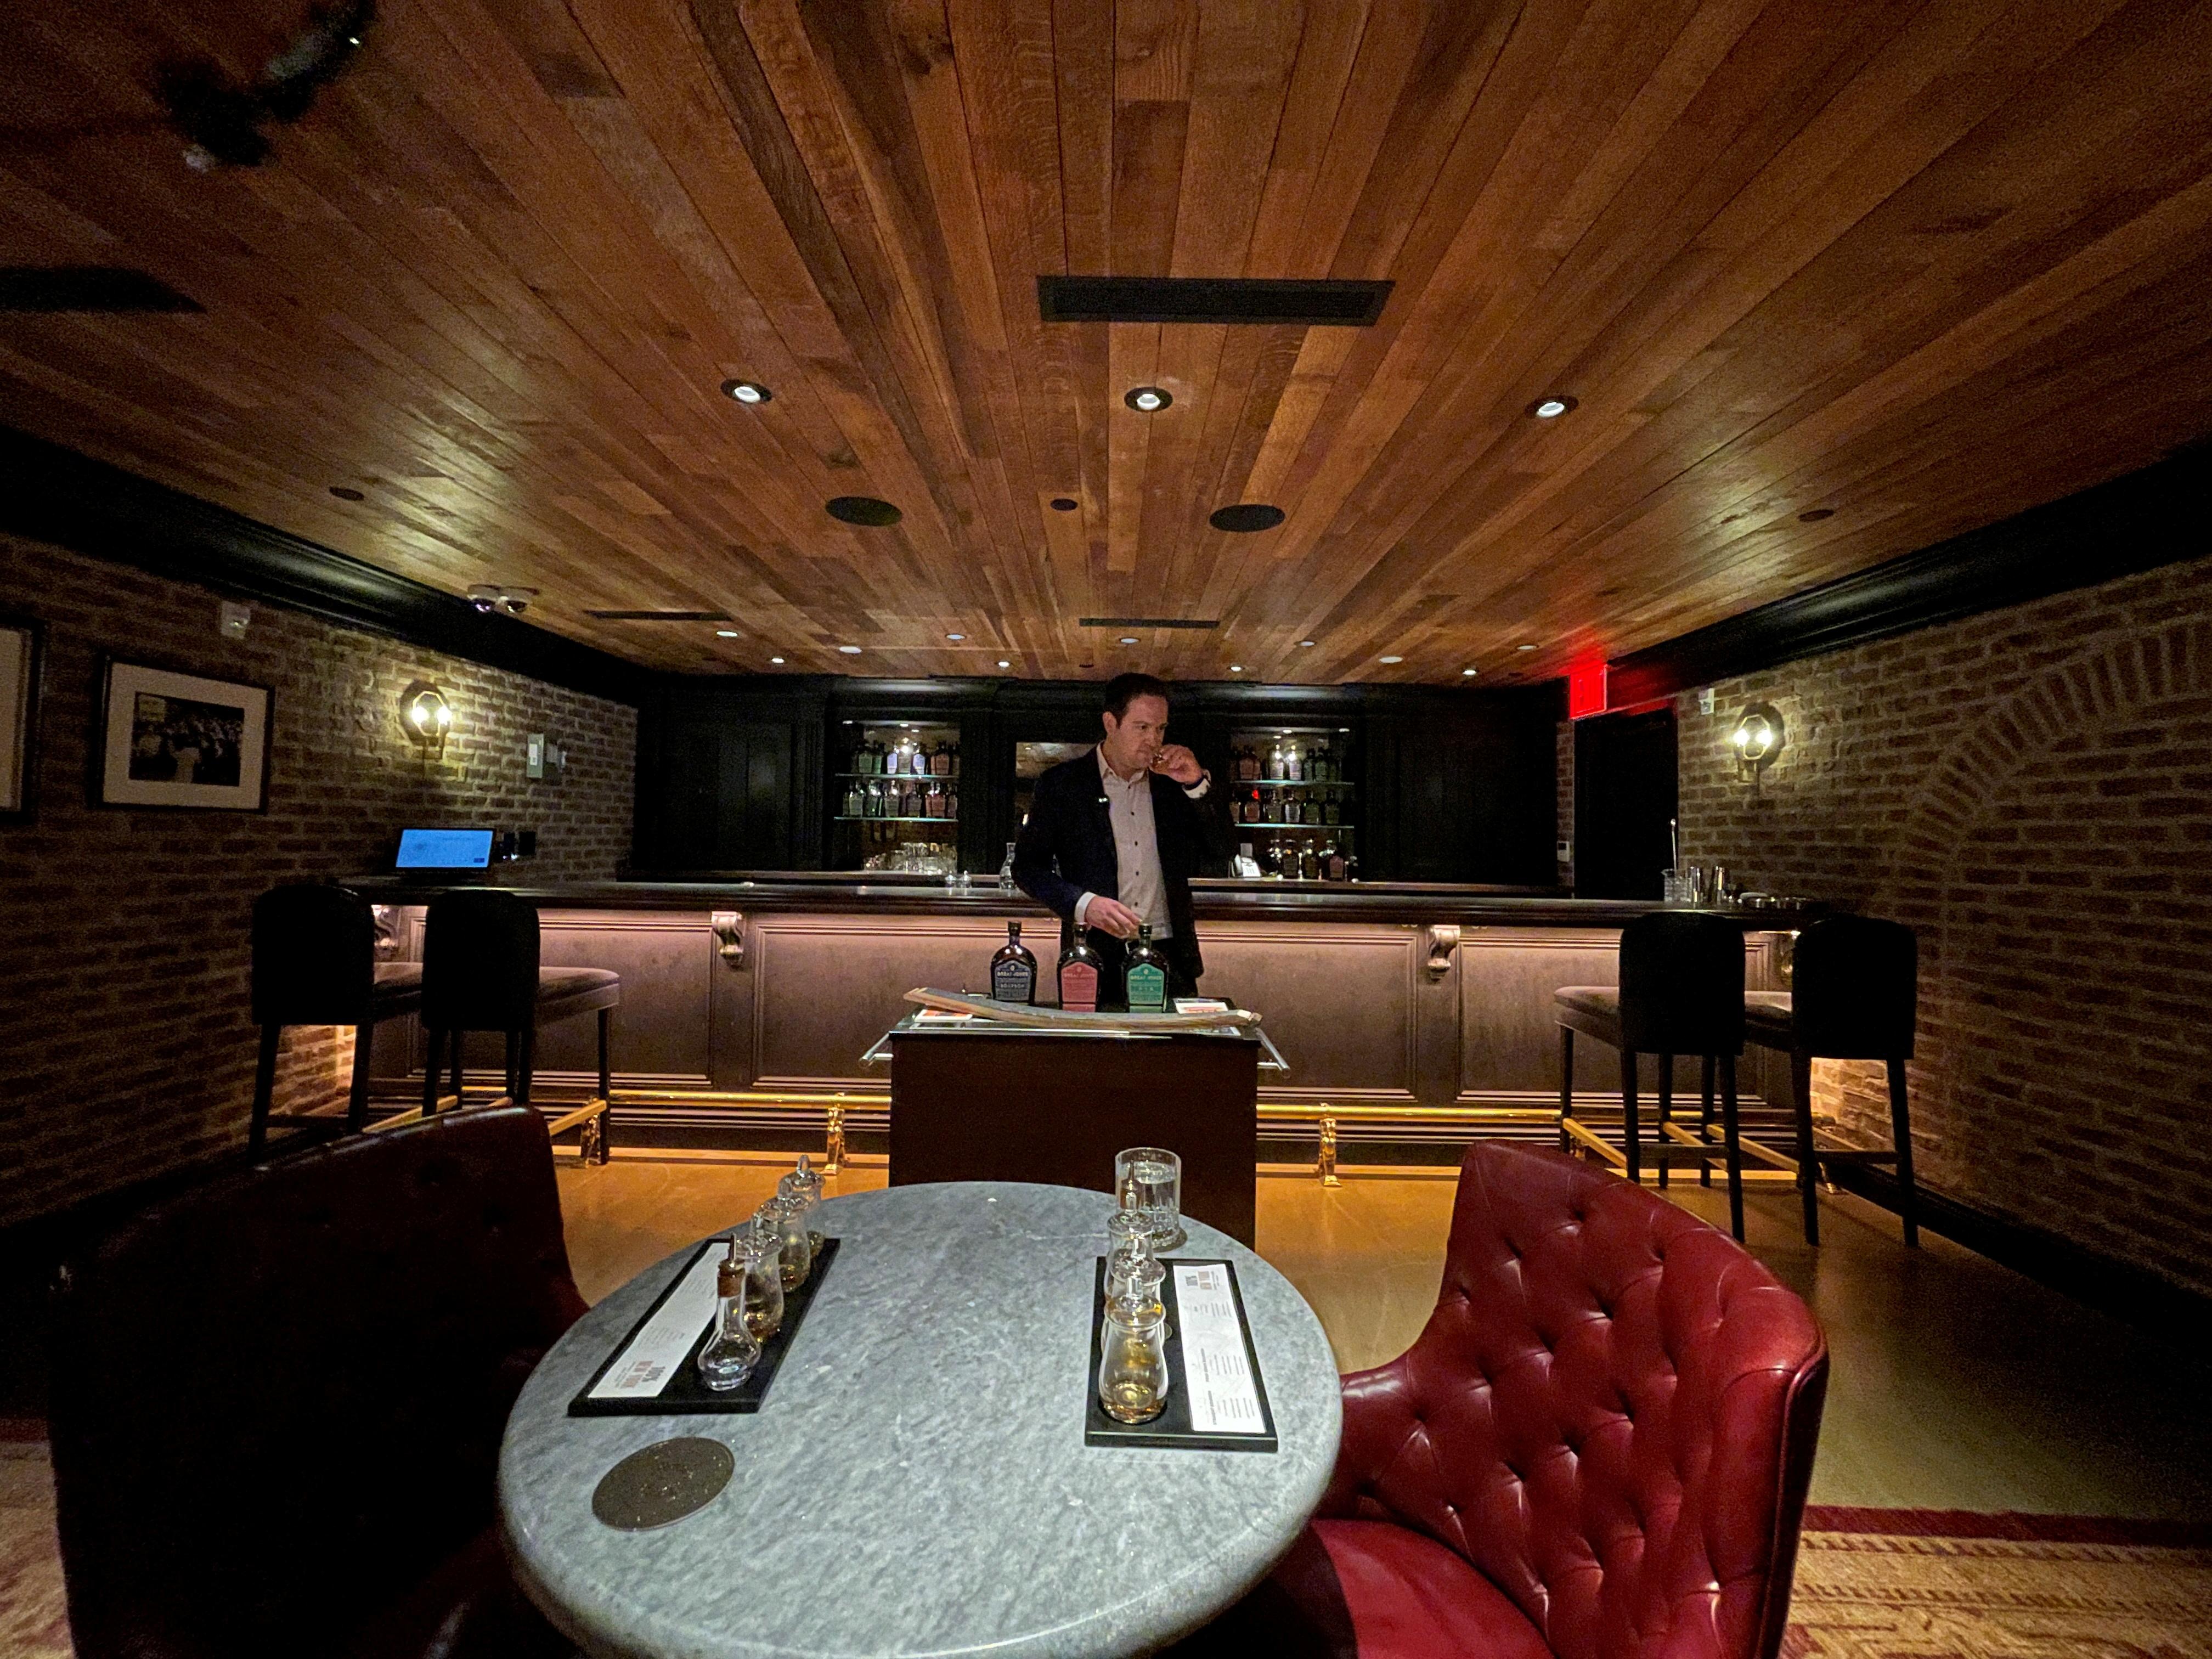 Andrew Merinoff, Great Jones Distilling Co. project manager, stands inside the distillery's speakeasy in New York, NY, U.S., September 16, 2021. Picture taken September 16, 2021. REUTERS/Roselle Chen